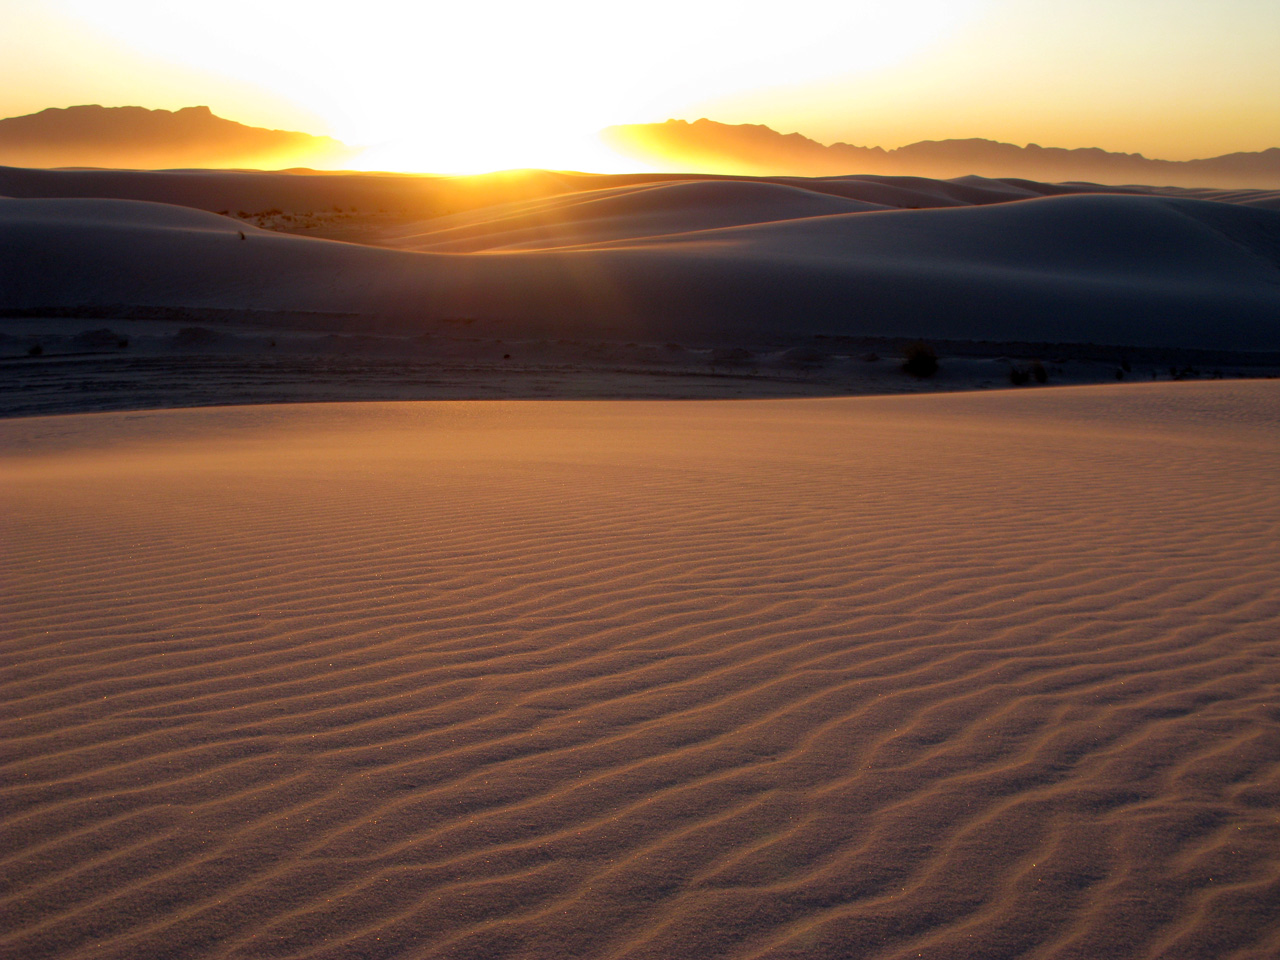 Sunset over White Sands National Monument.